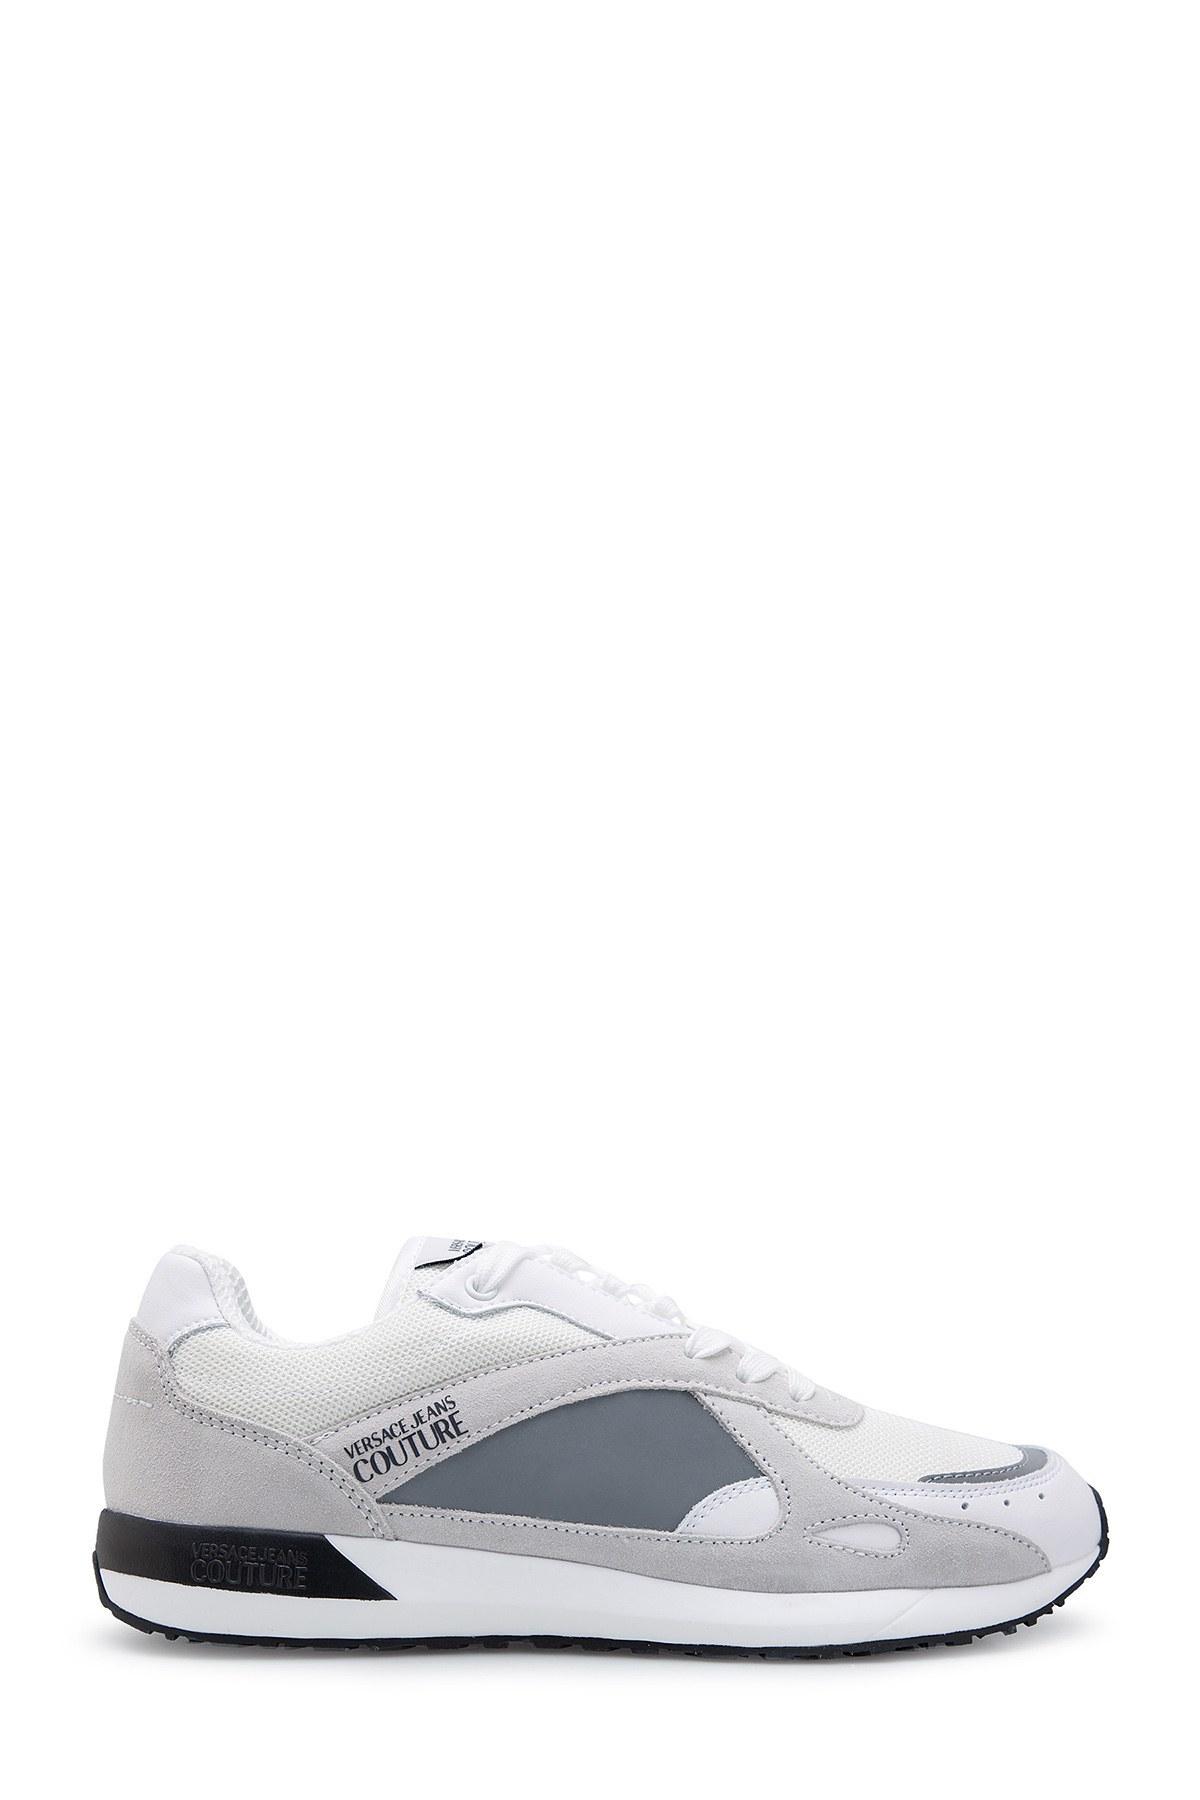 Versace Jeans Couture Erkek Ayakkabı E0YVBSR4 71398 003 BEYAZ